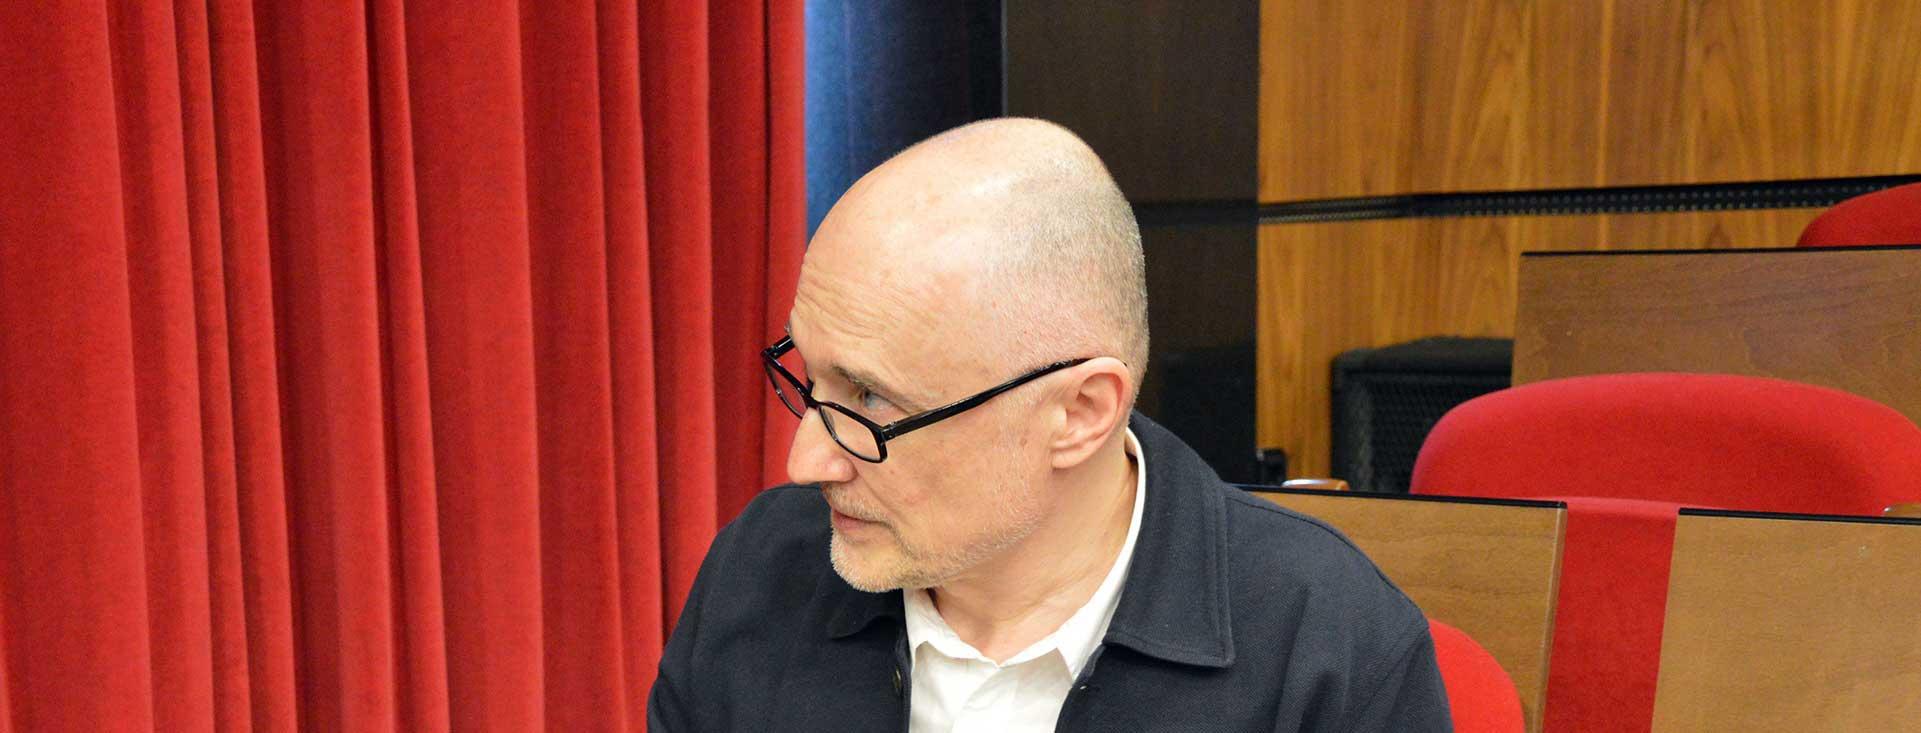 Richard McGuire Interview